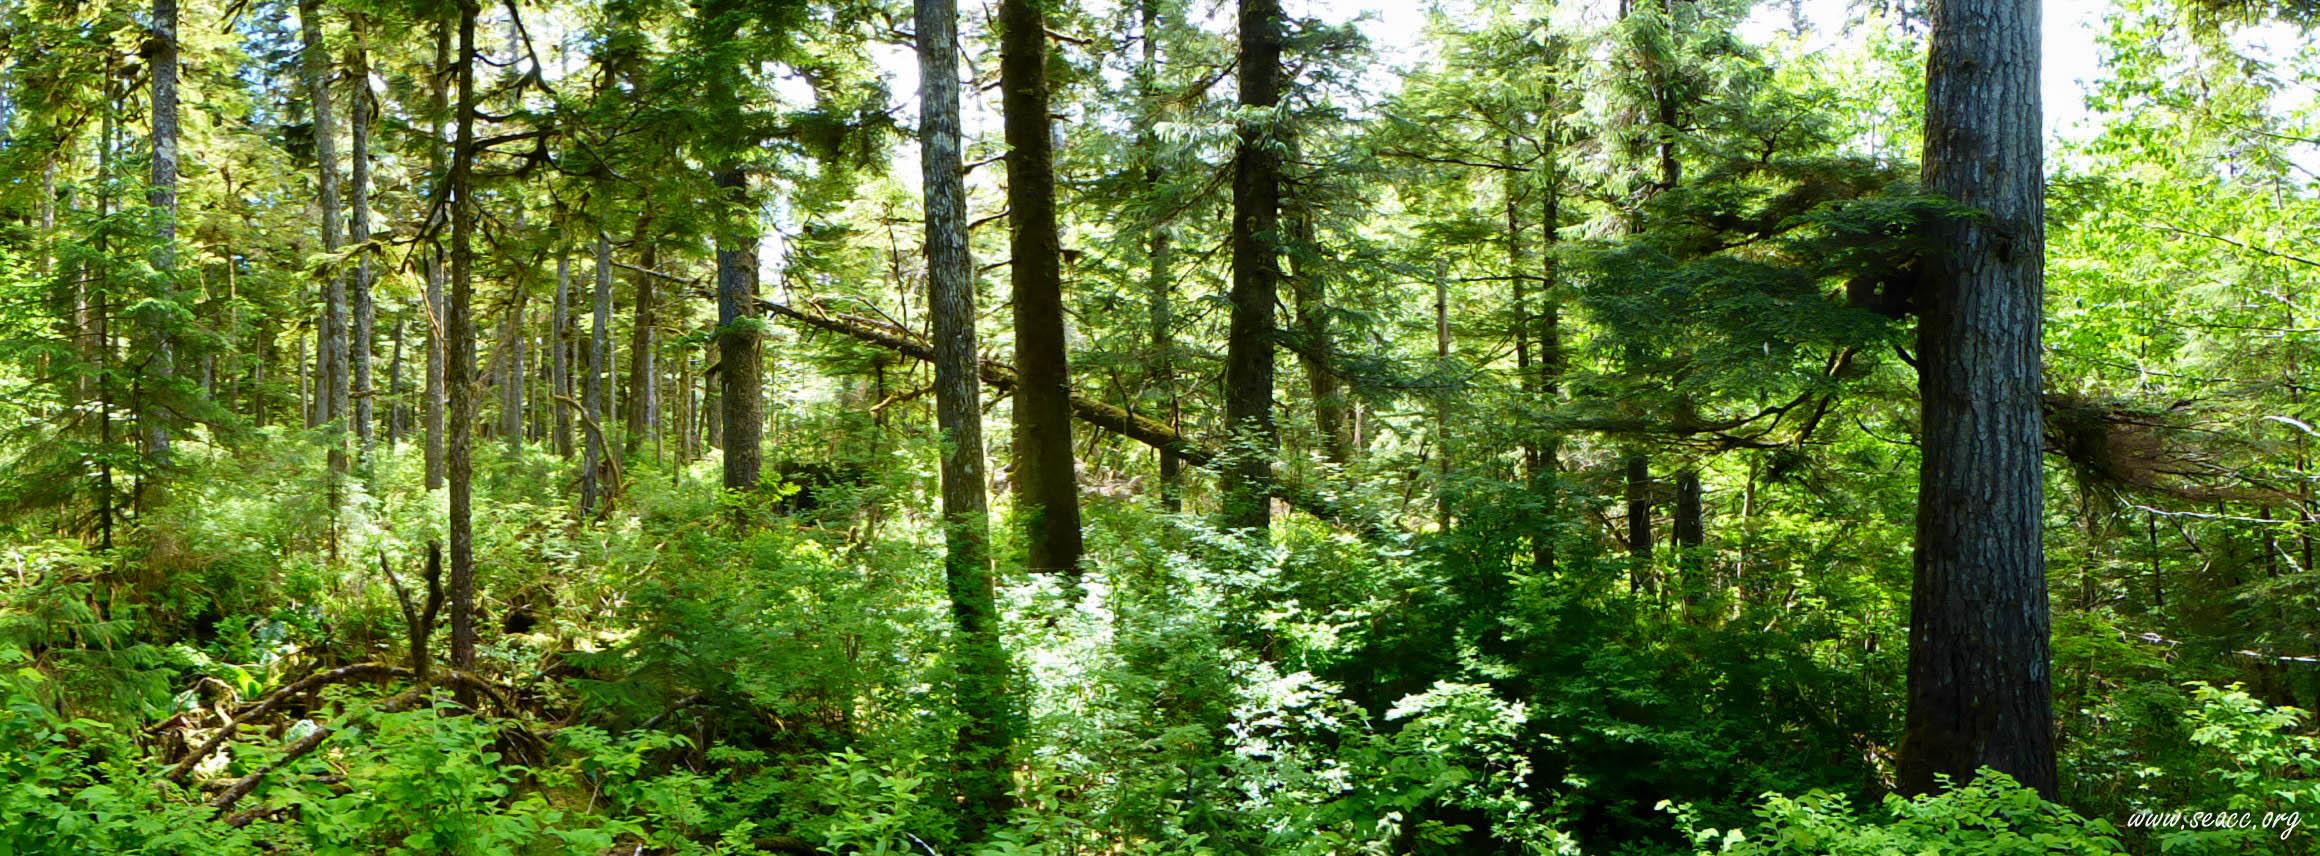 Forest_panorama.jpg